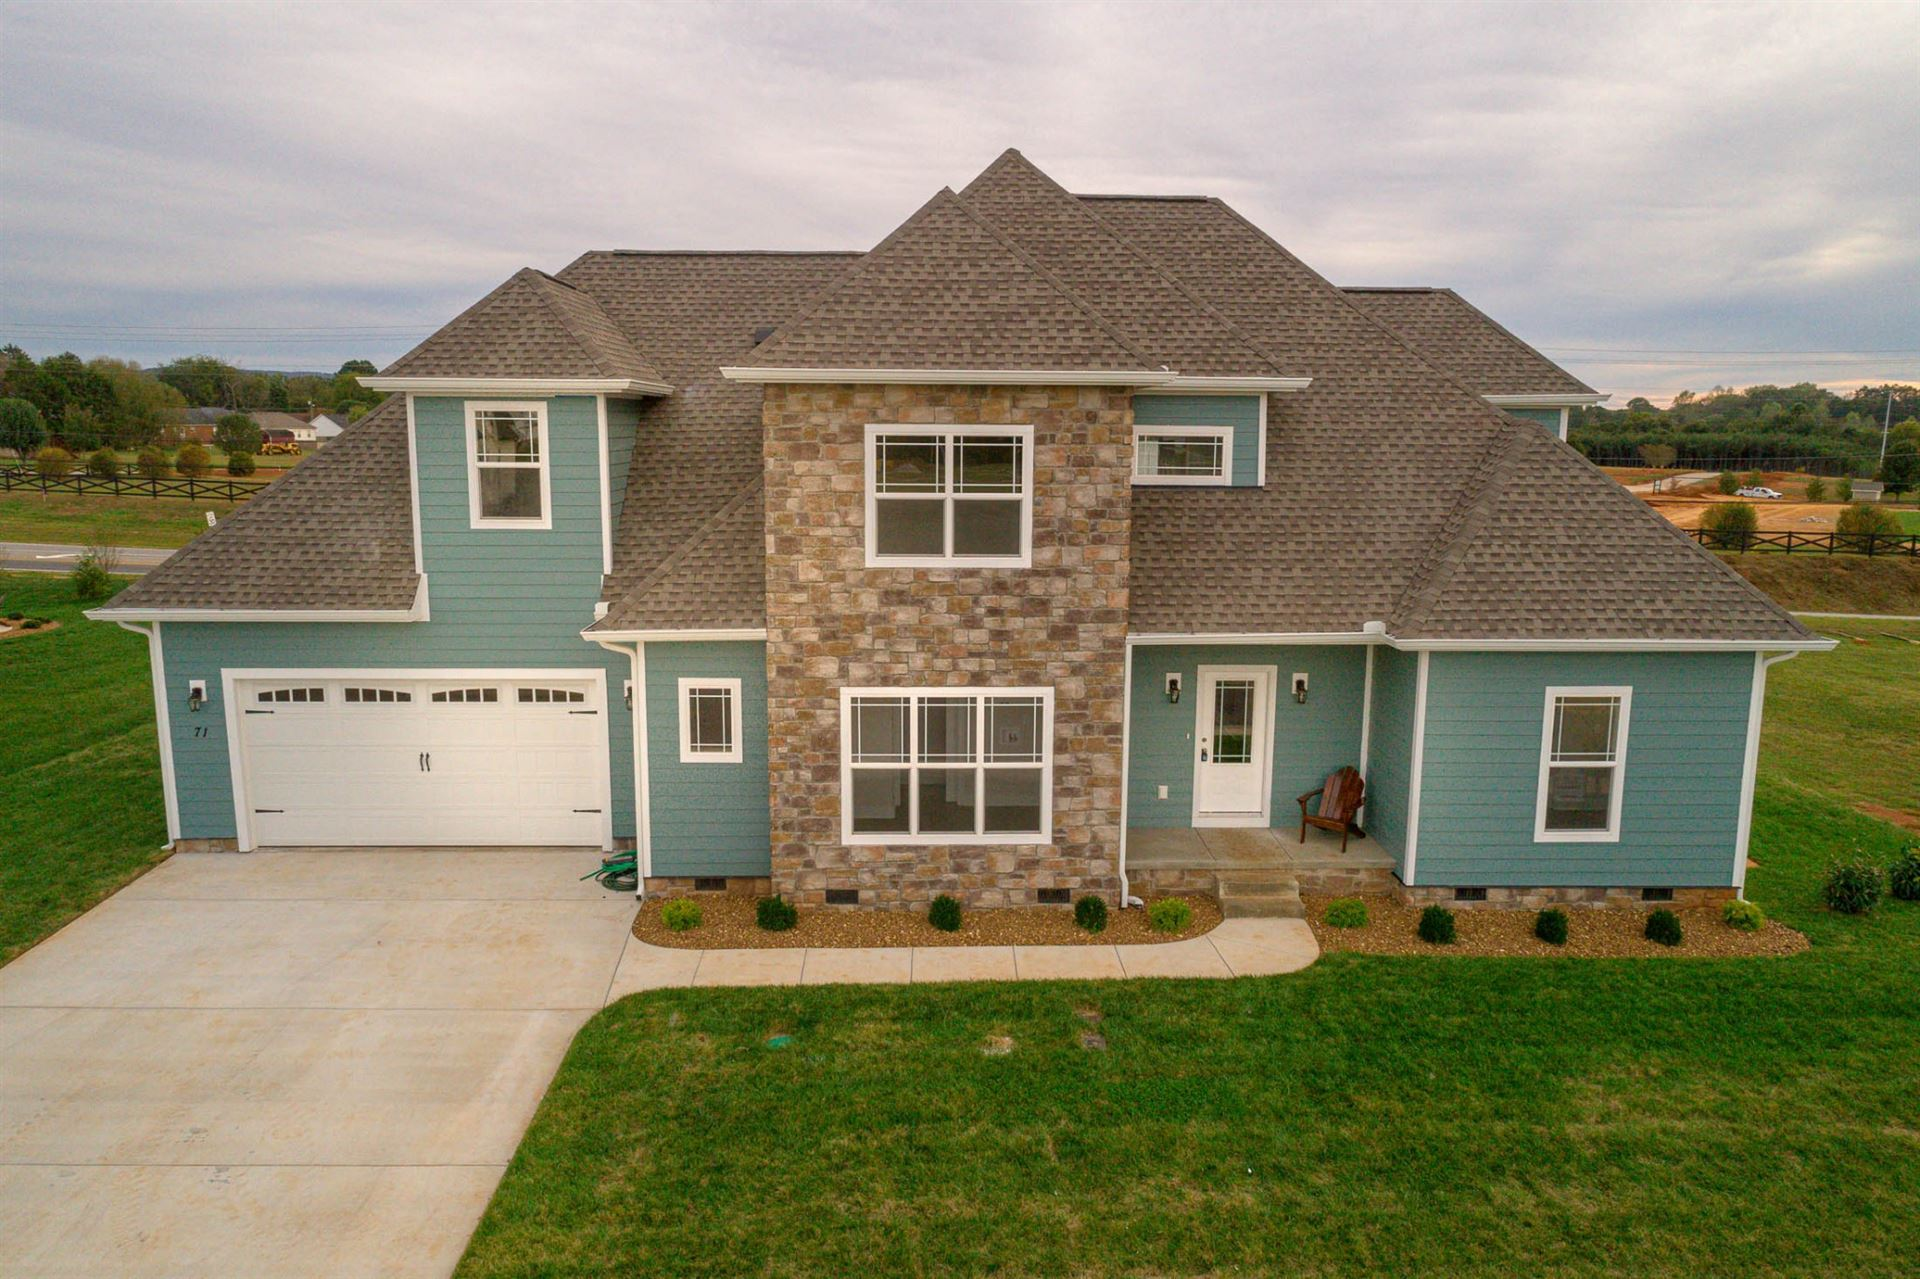 71 Windjammer Ct, Winchester, TN 37398 - MLS#: 2191831